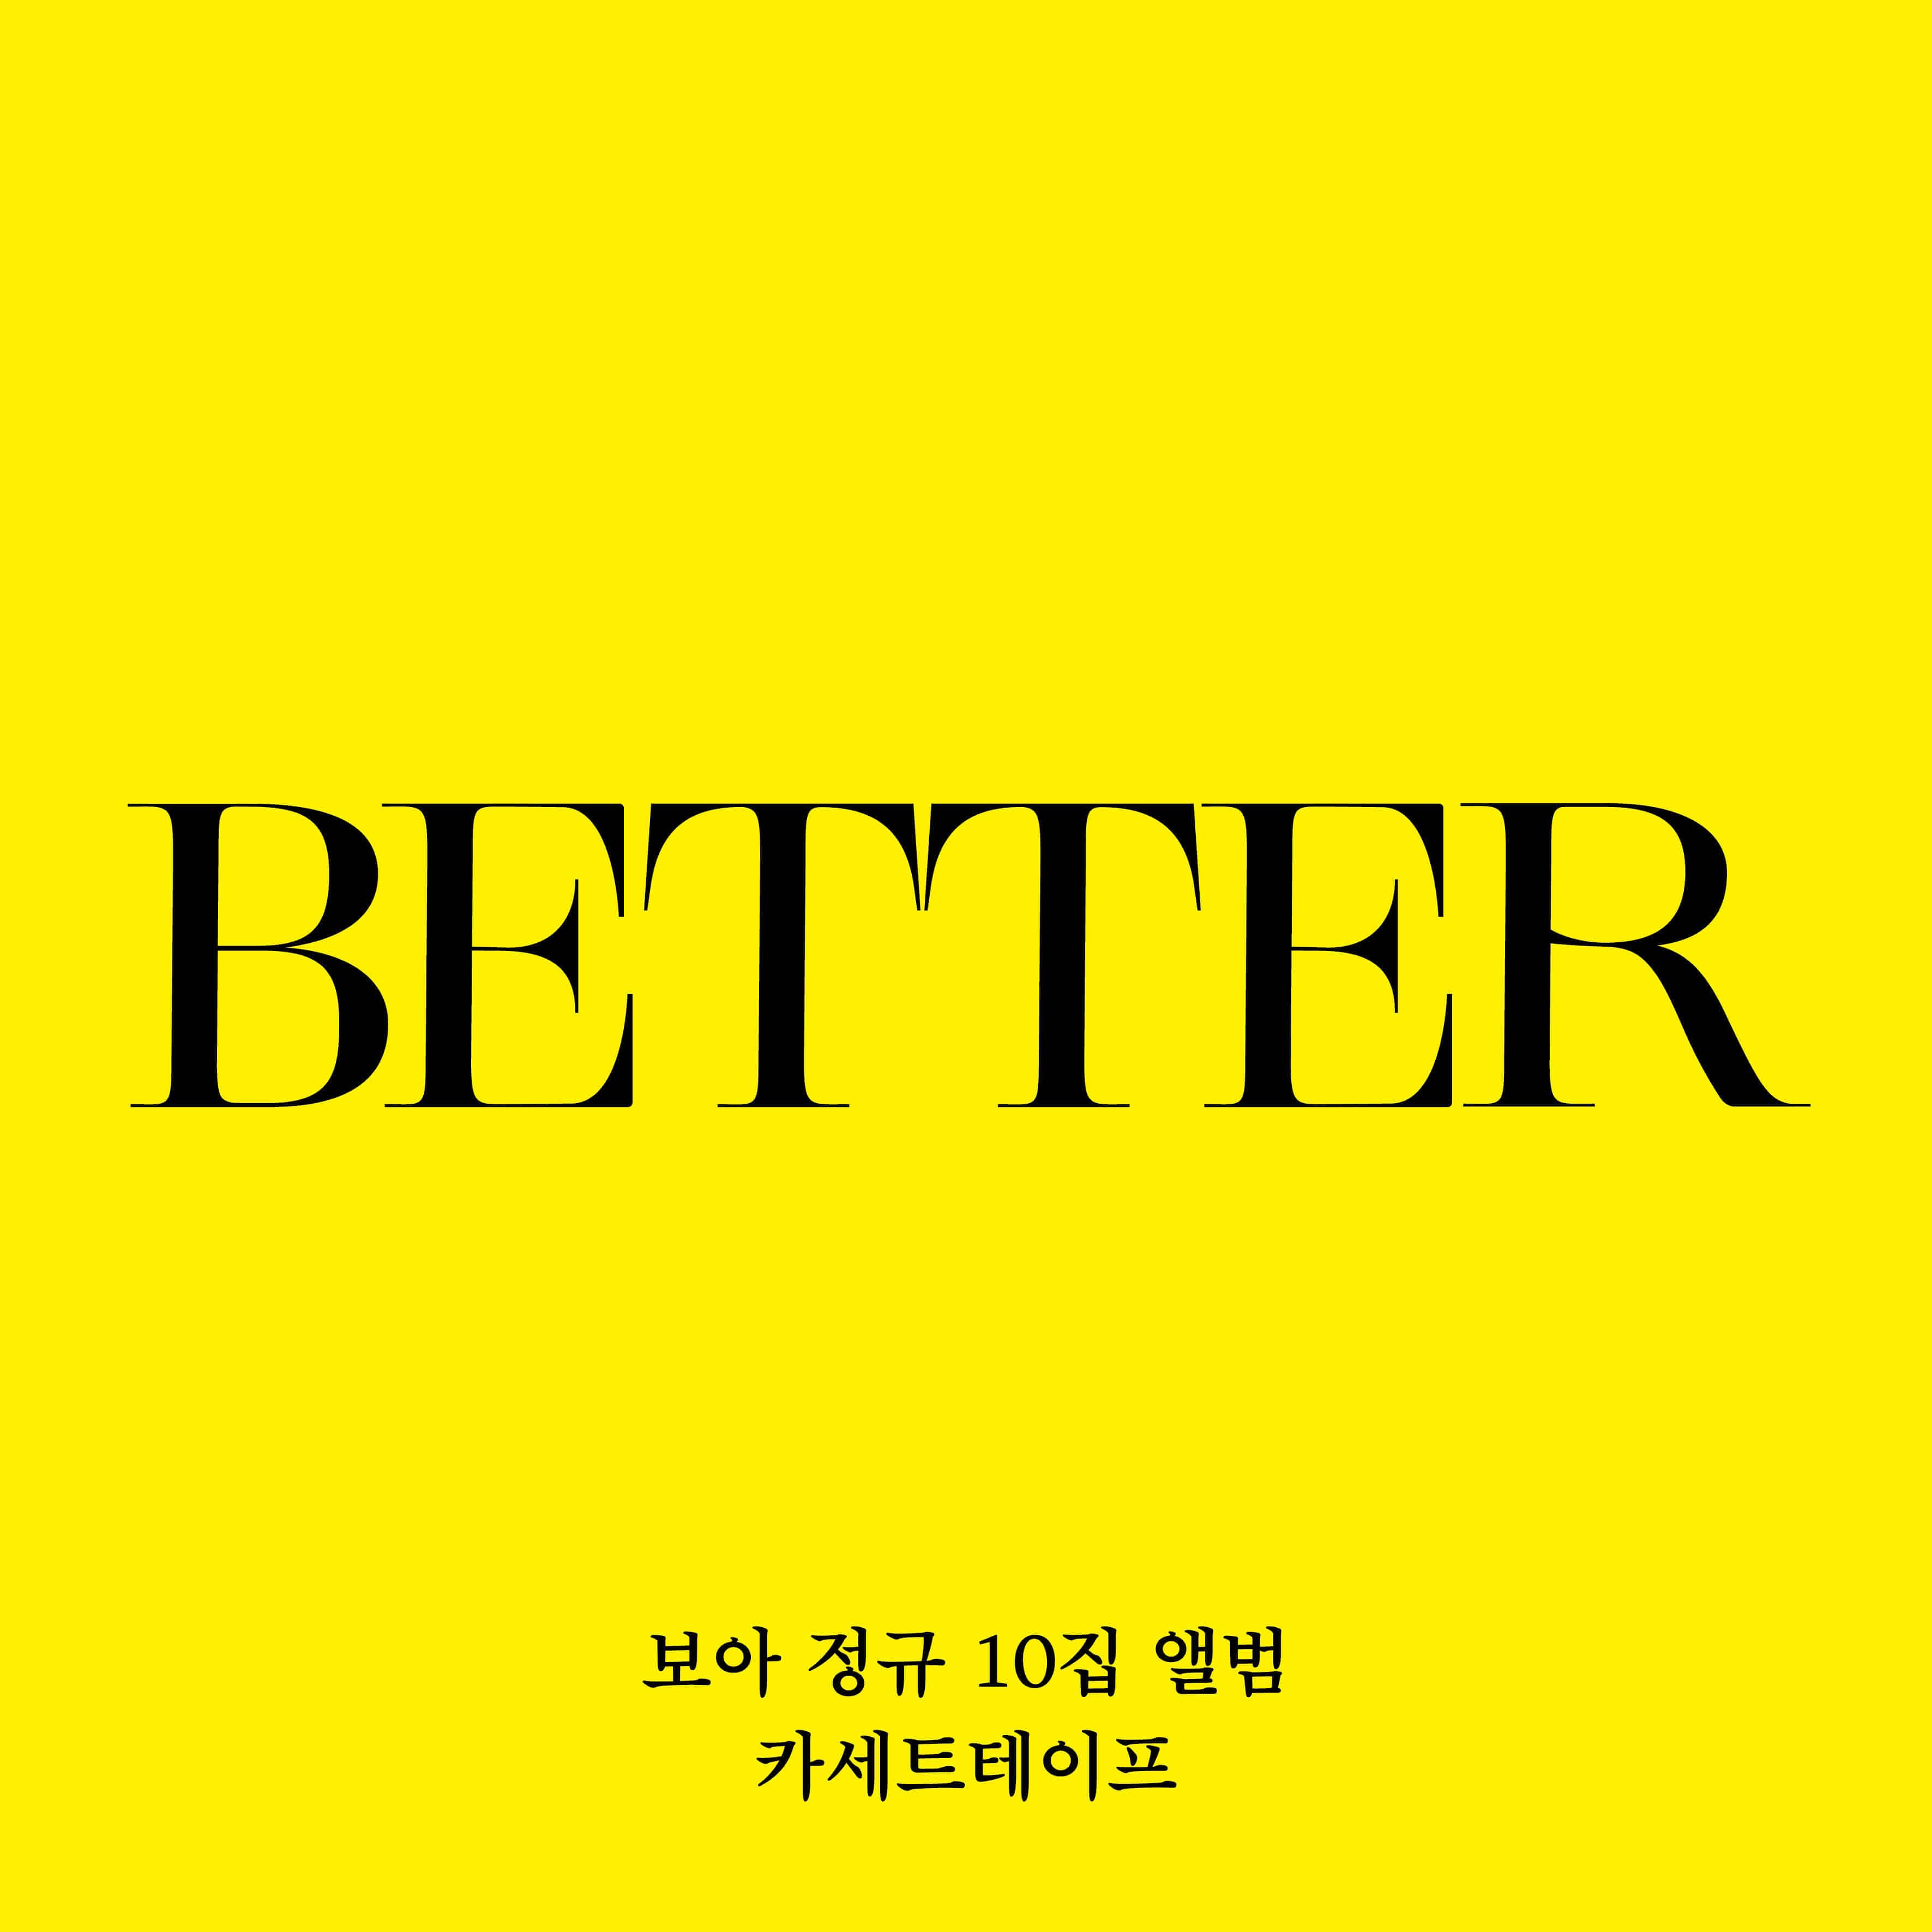 BoA - Album Vol.10 [BETTER] (first press Limited Edition) (Cassette Tape)케이팝스토어(kpop store)